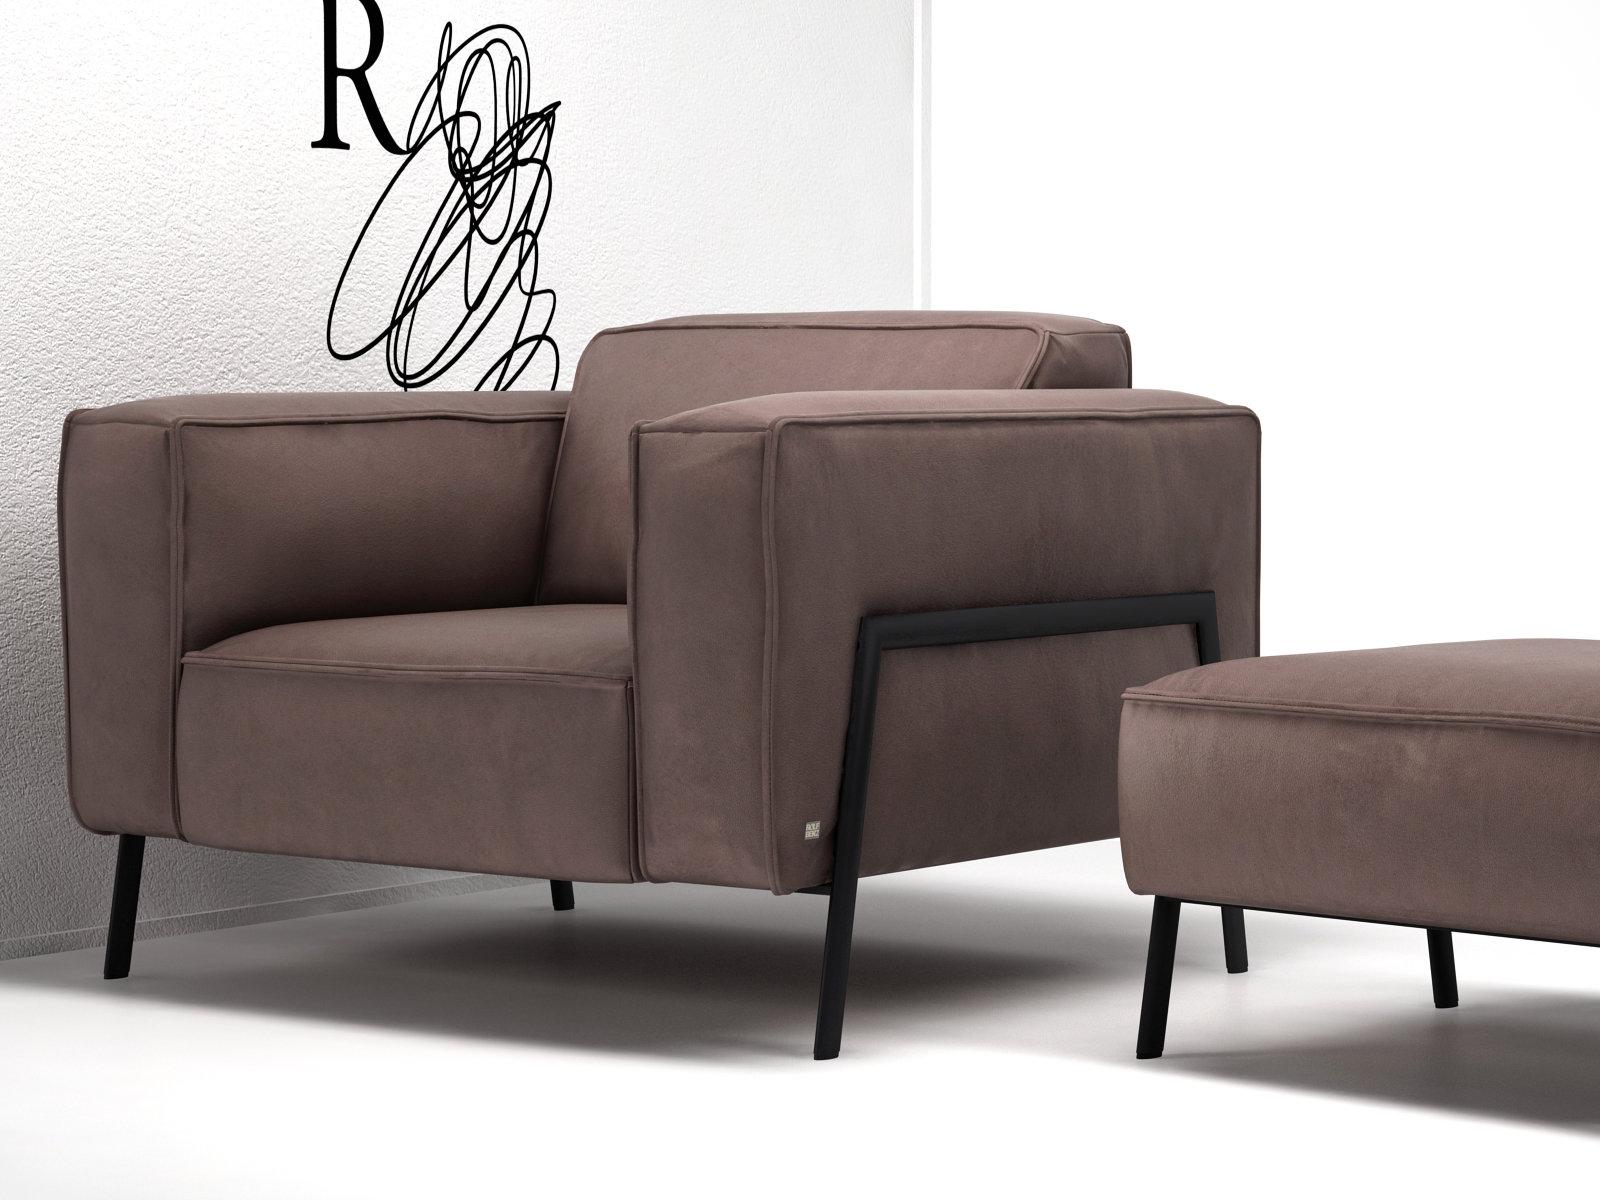 Design Armchair 3d Model   Bacio Armchair 3d Model Rolf Benz